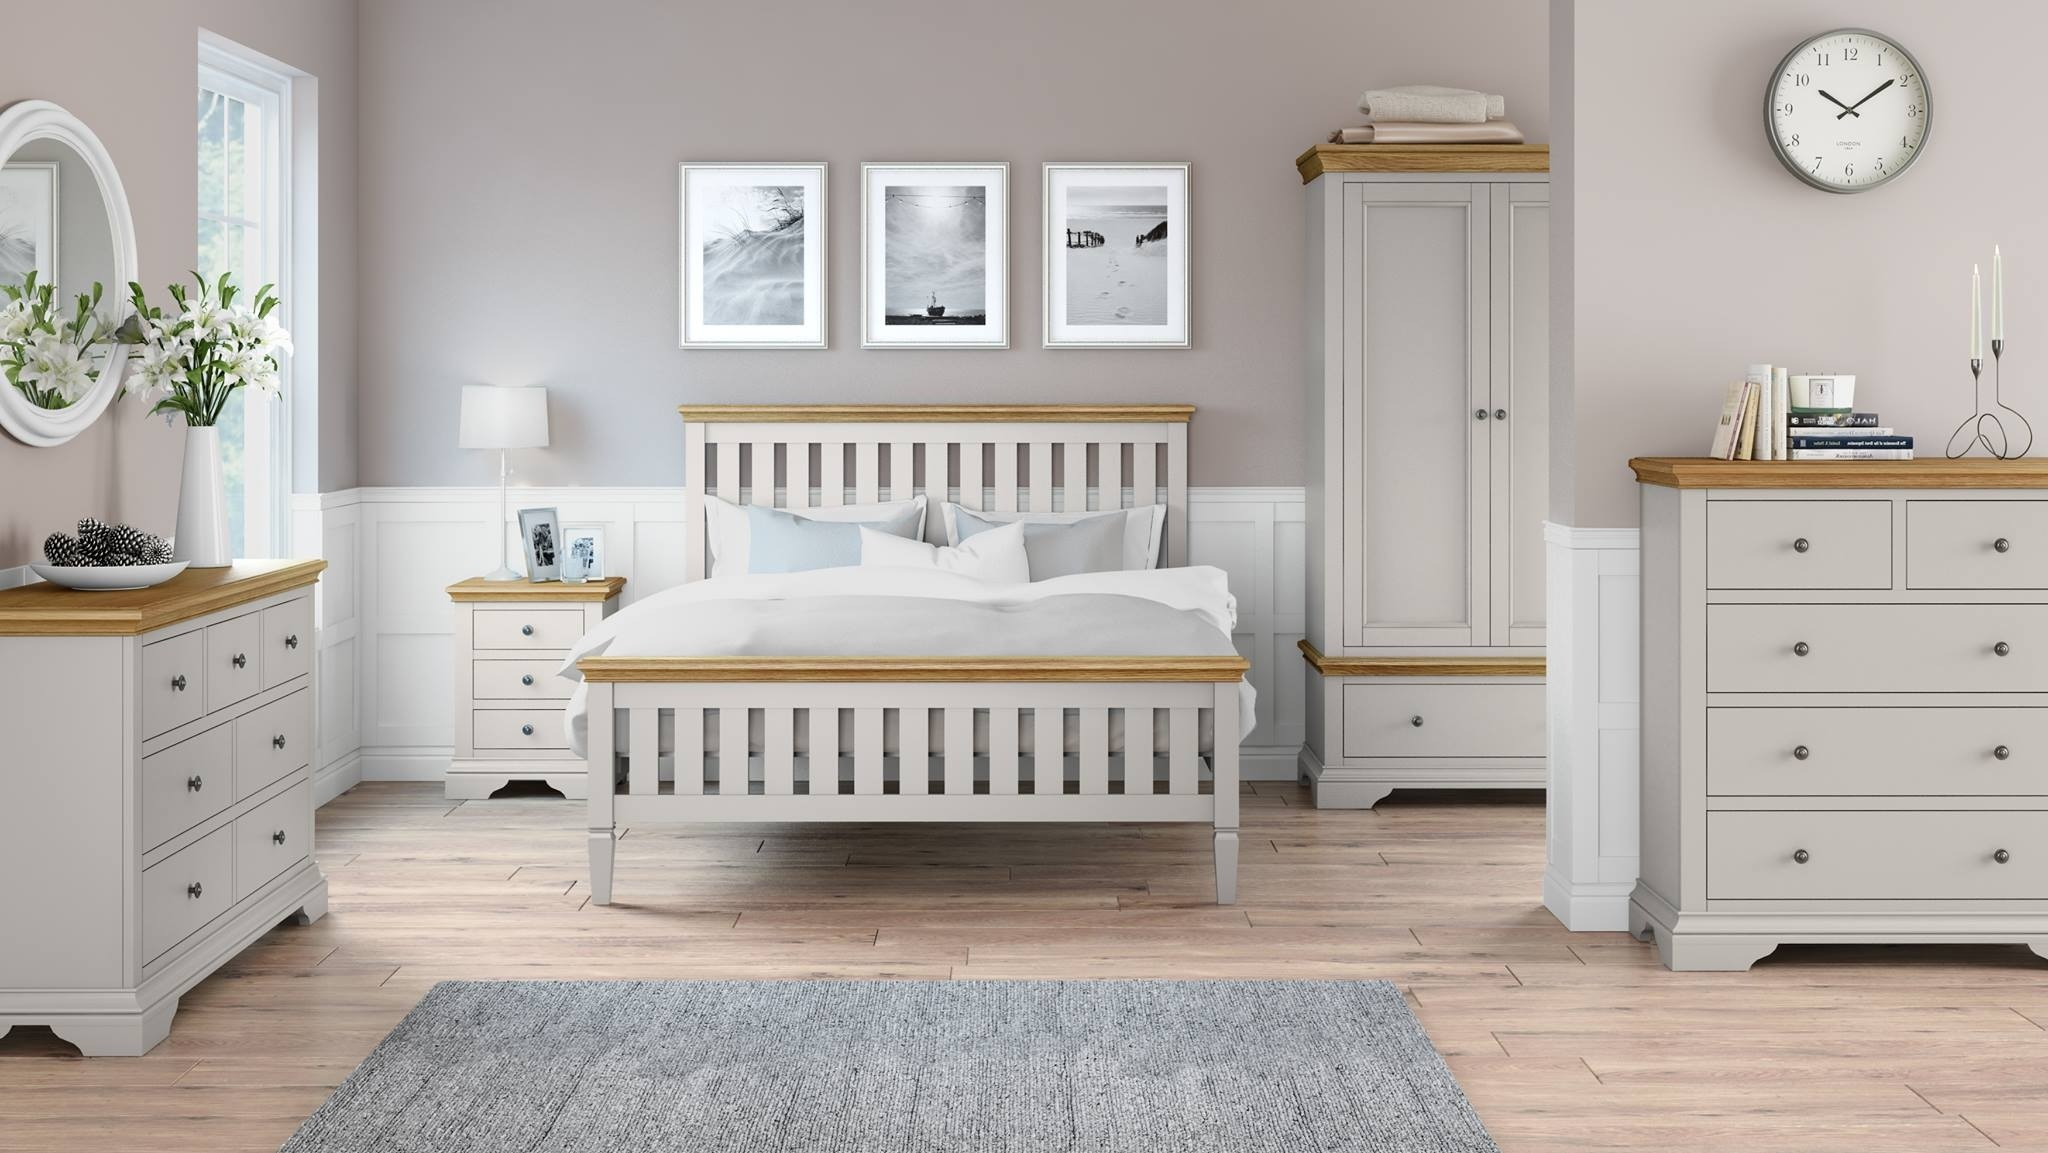 York Bedroom Furniture - Preston, Lancashire